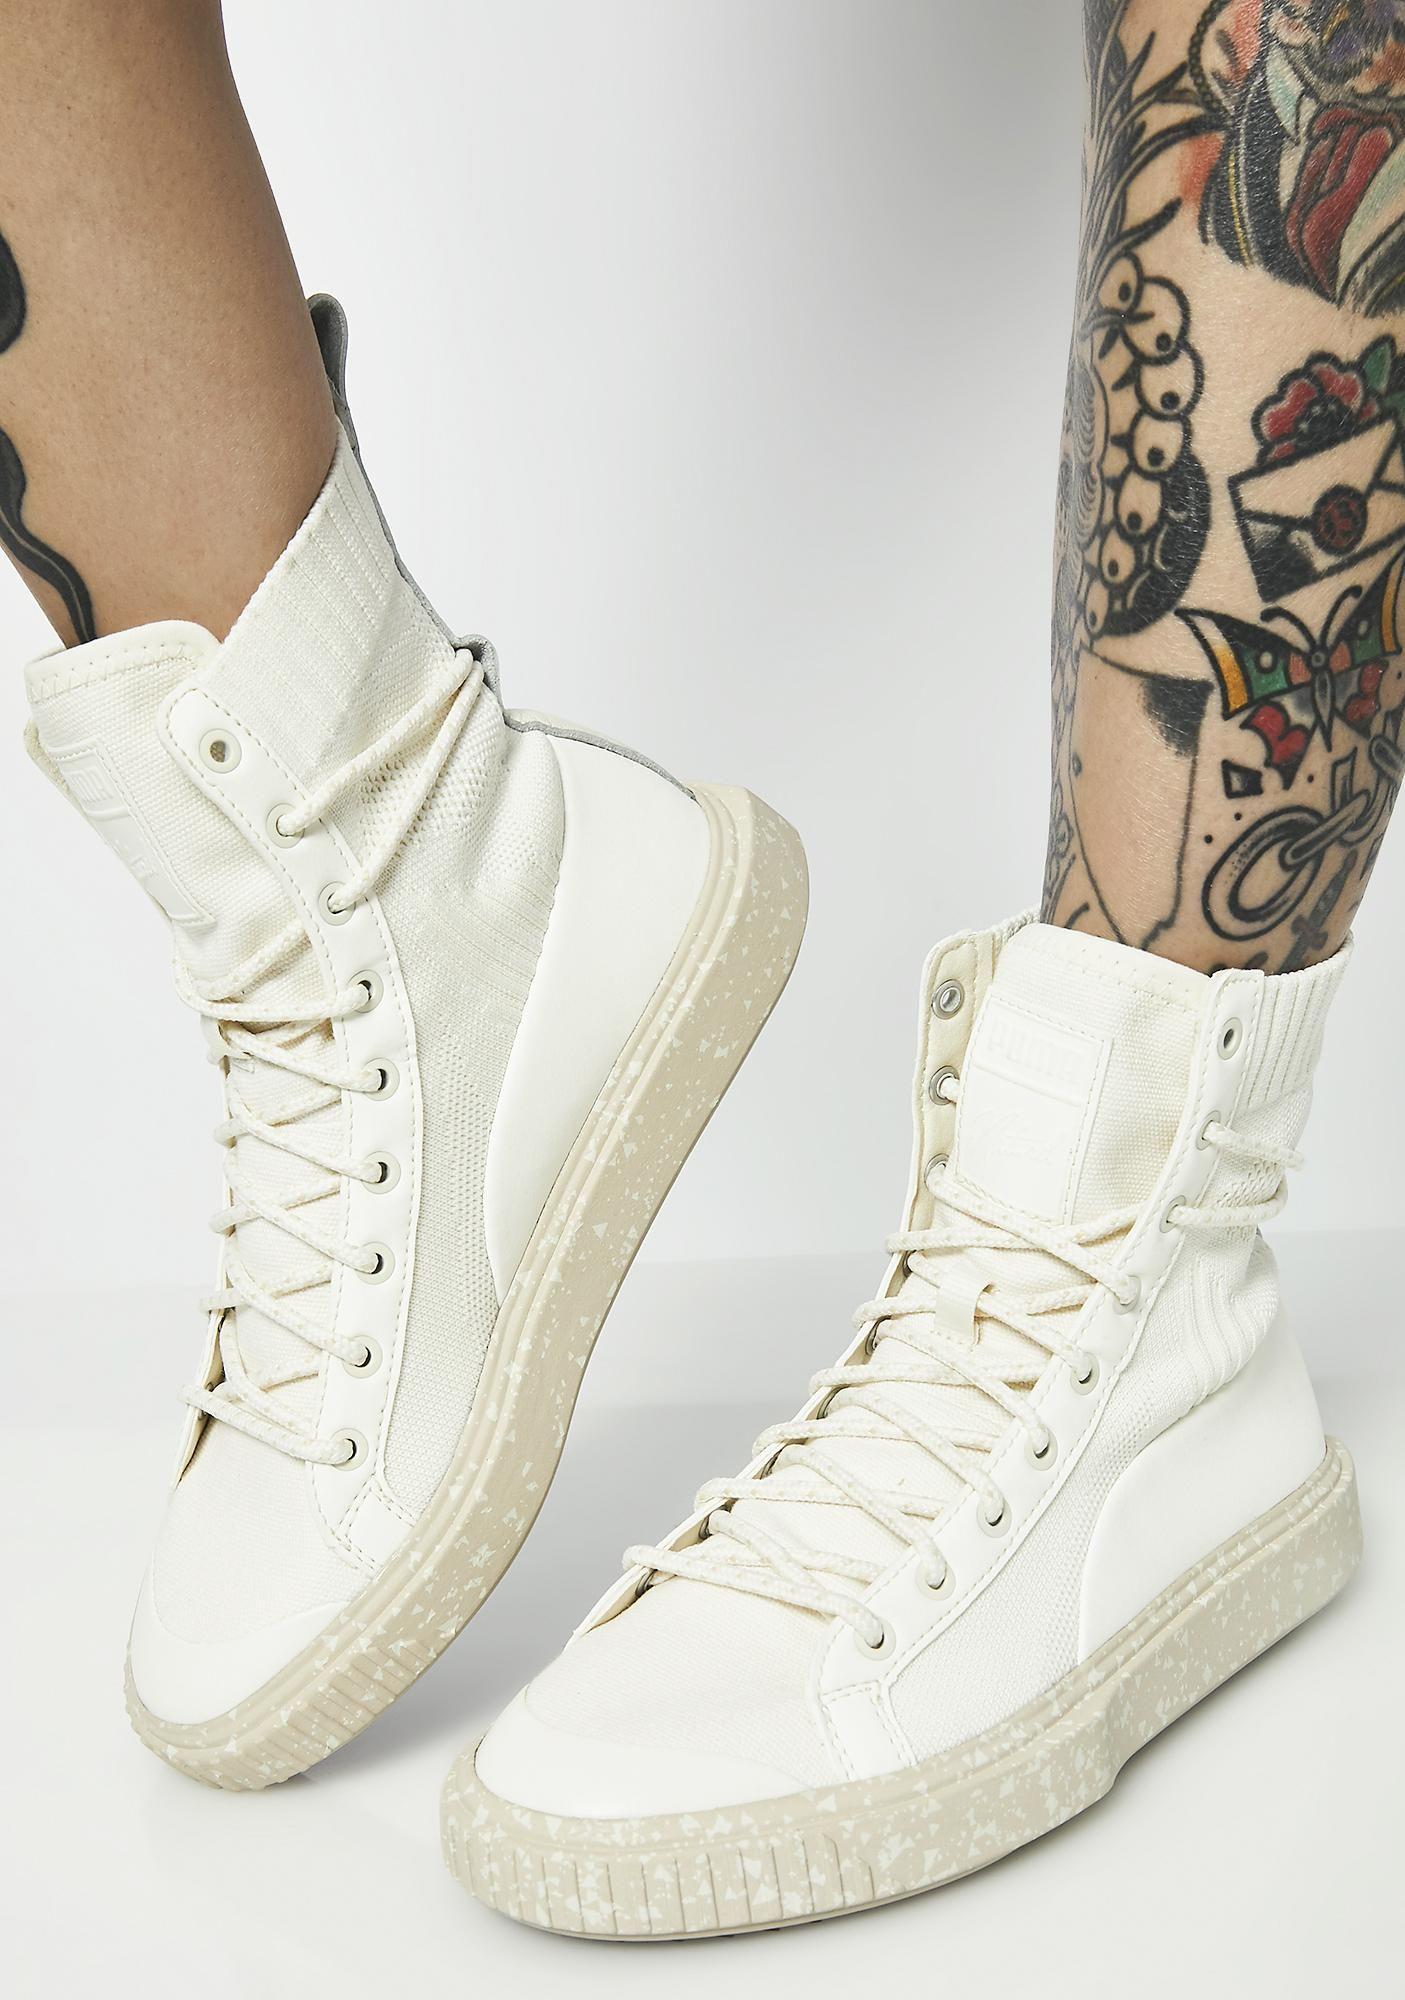 puma x naturel breaker boot